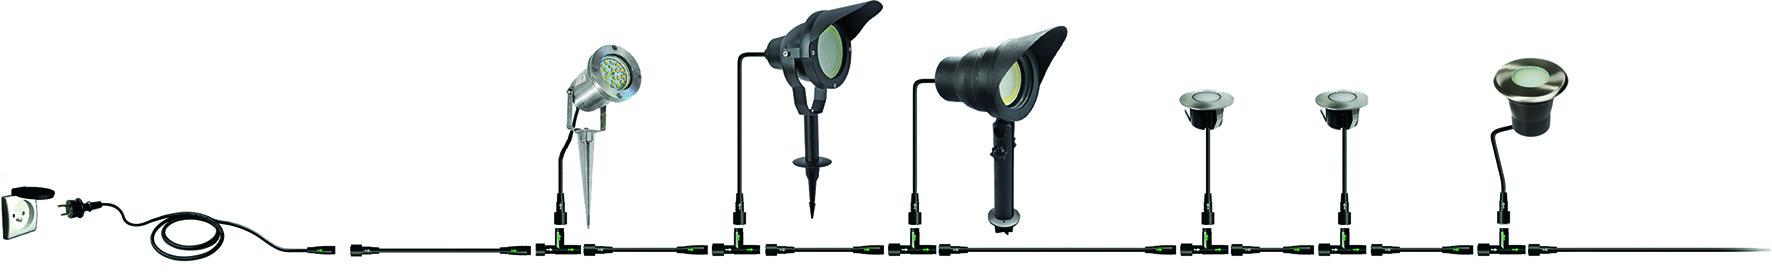 LED Terrassen Anbauleuchte EASY CONNECT